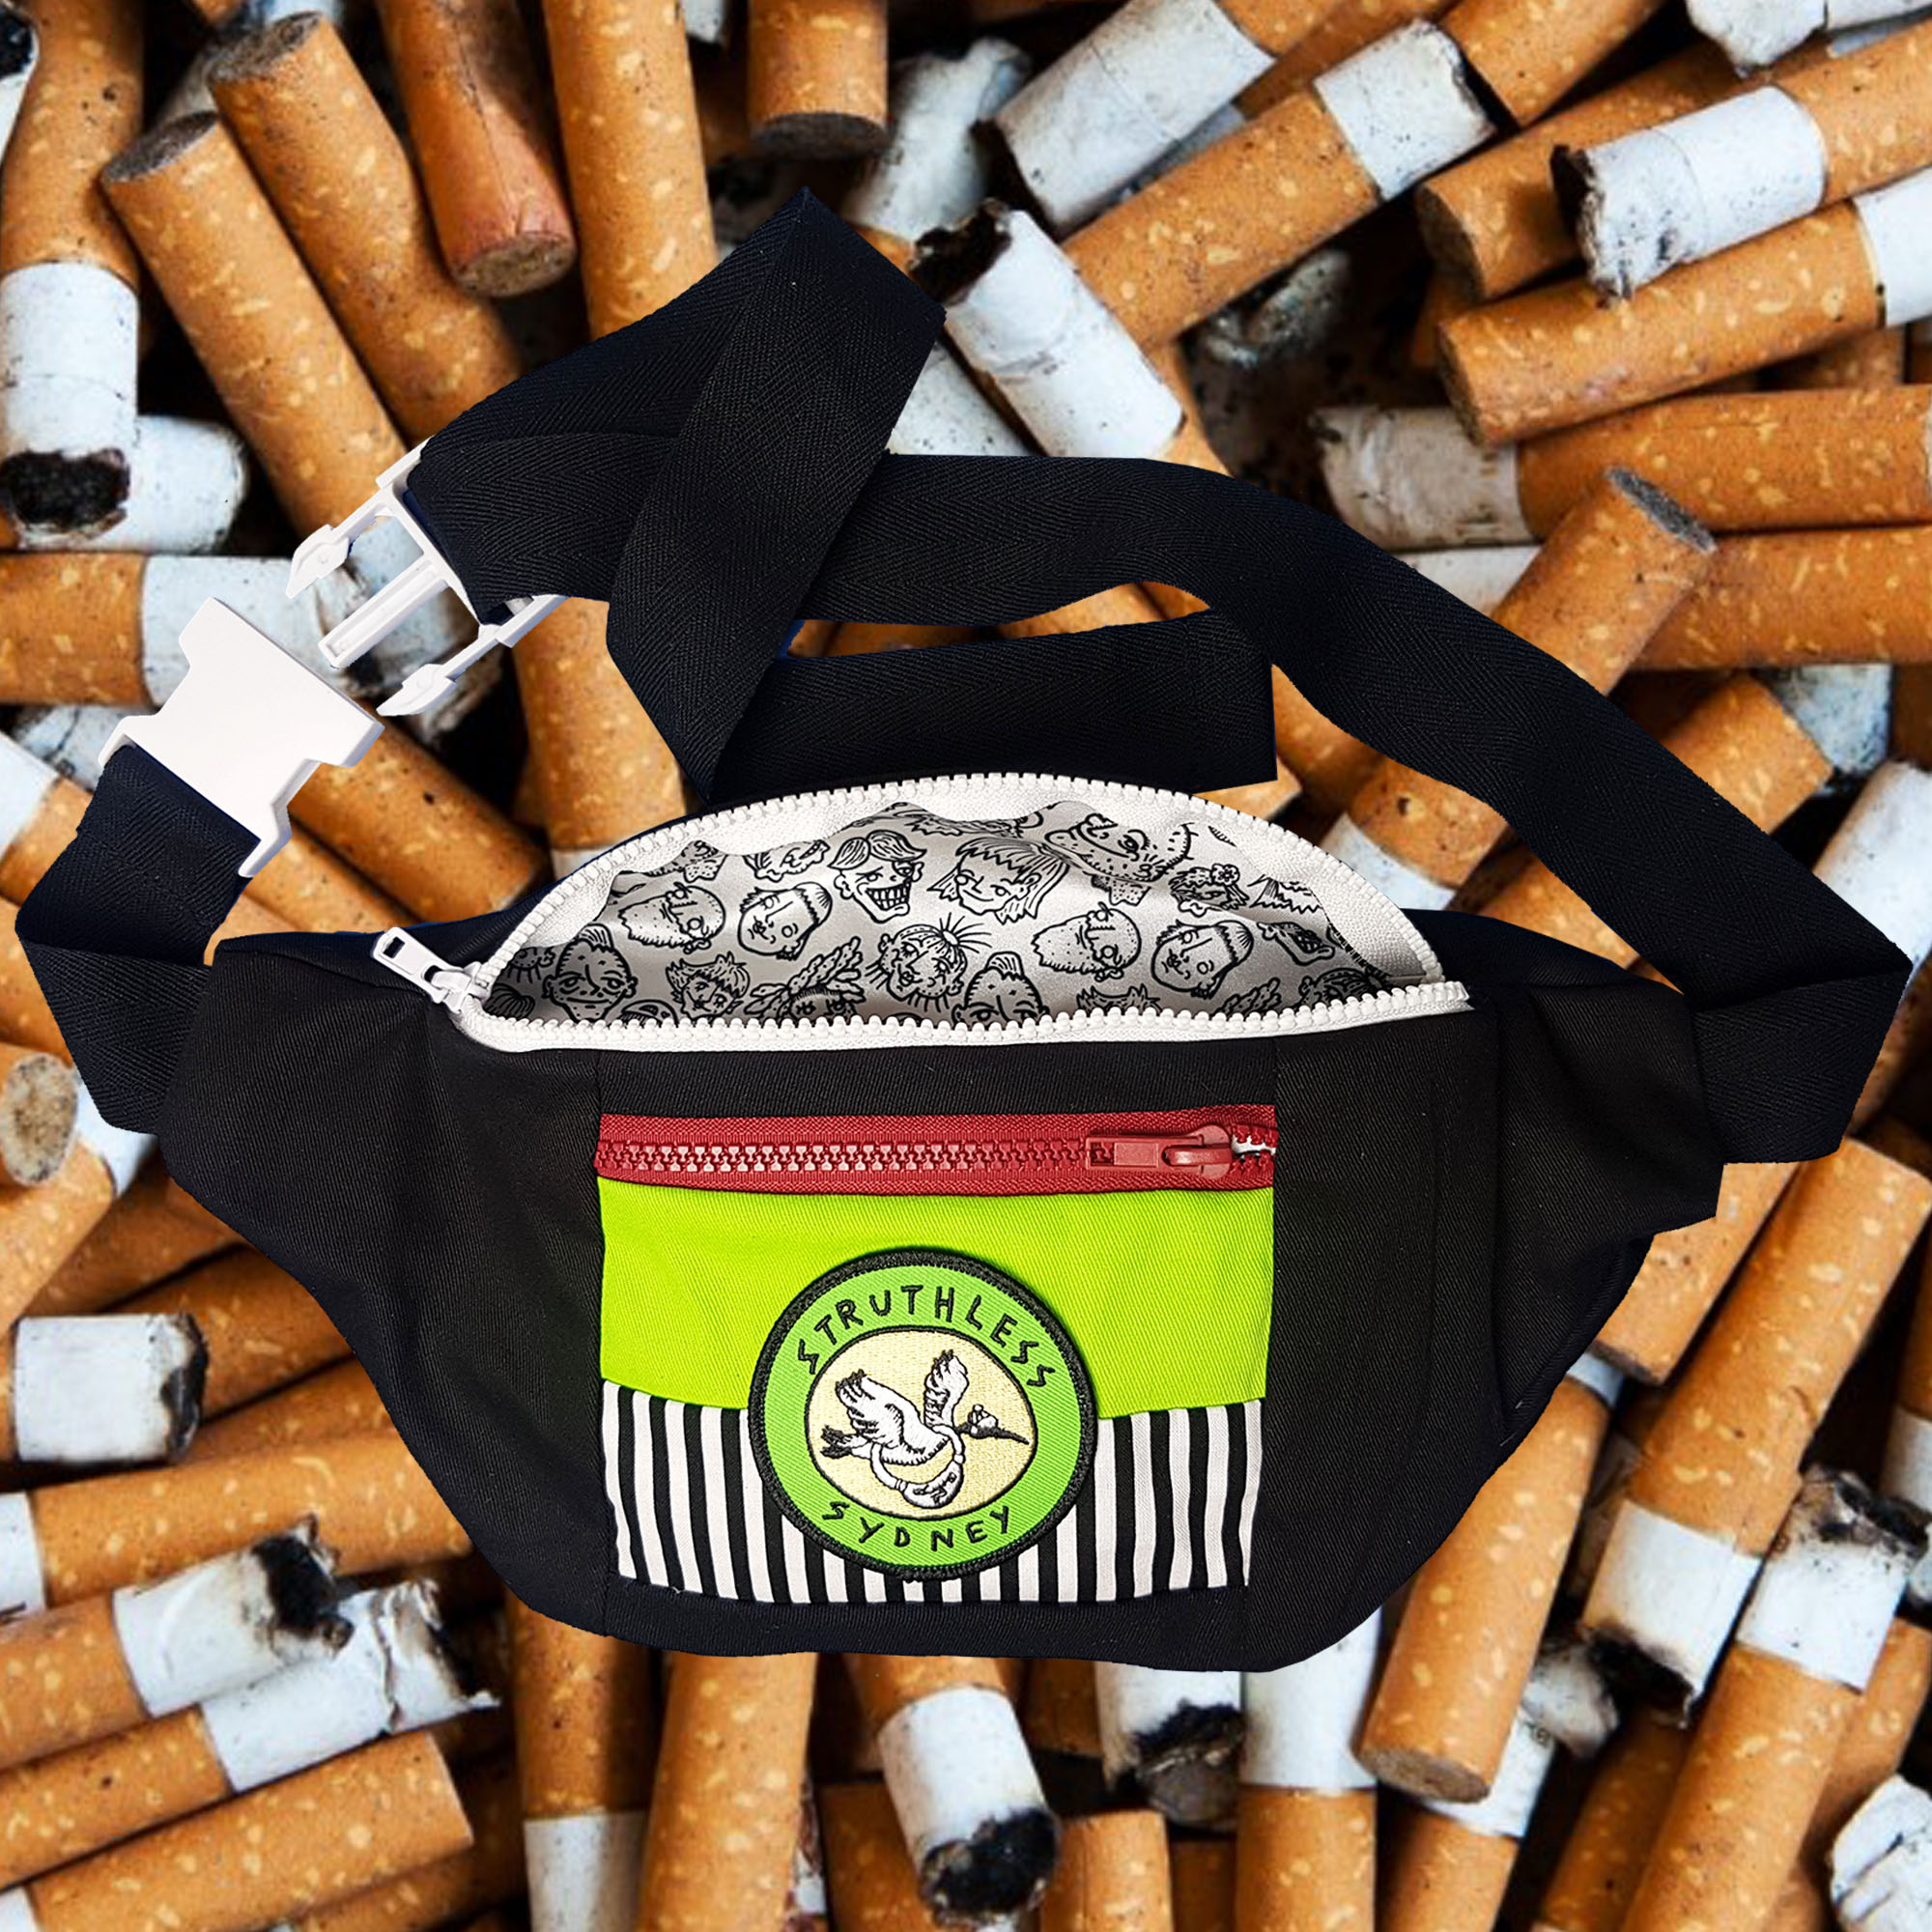 ashtray flatylay inside.jpg